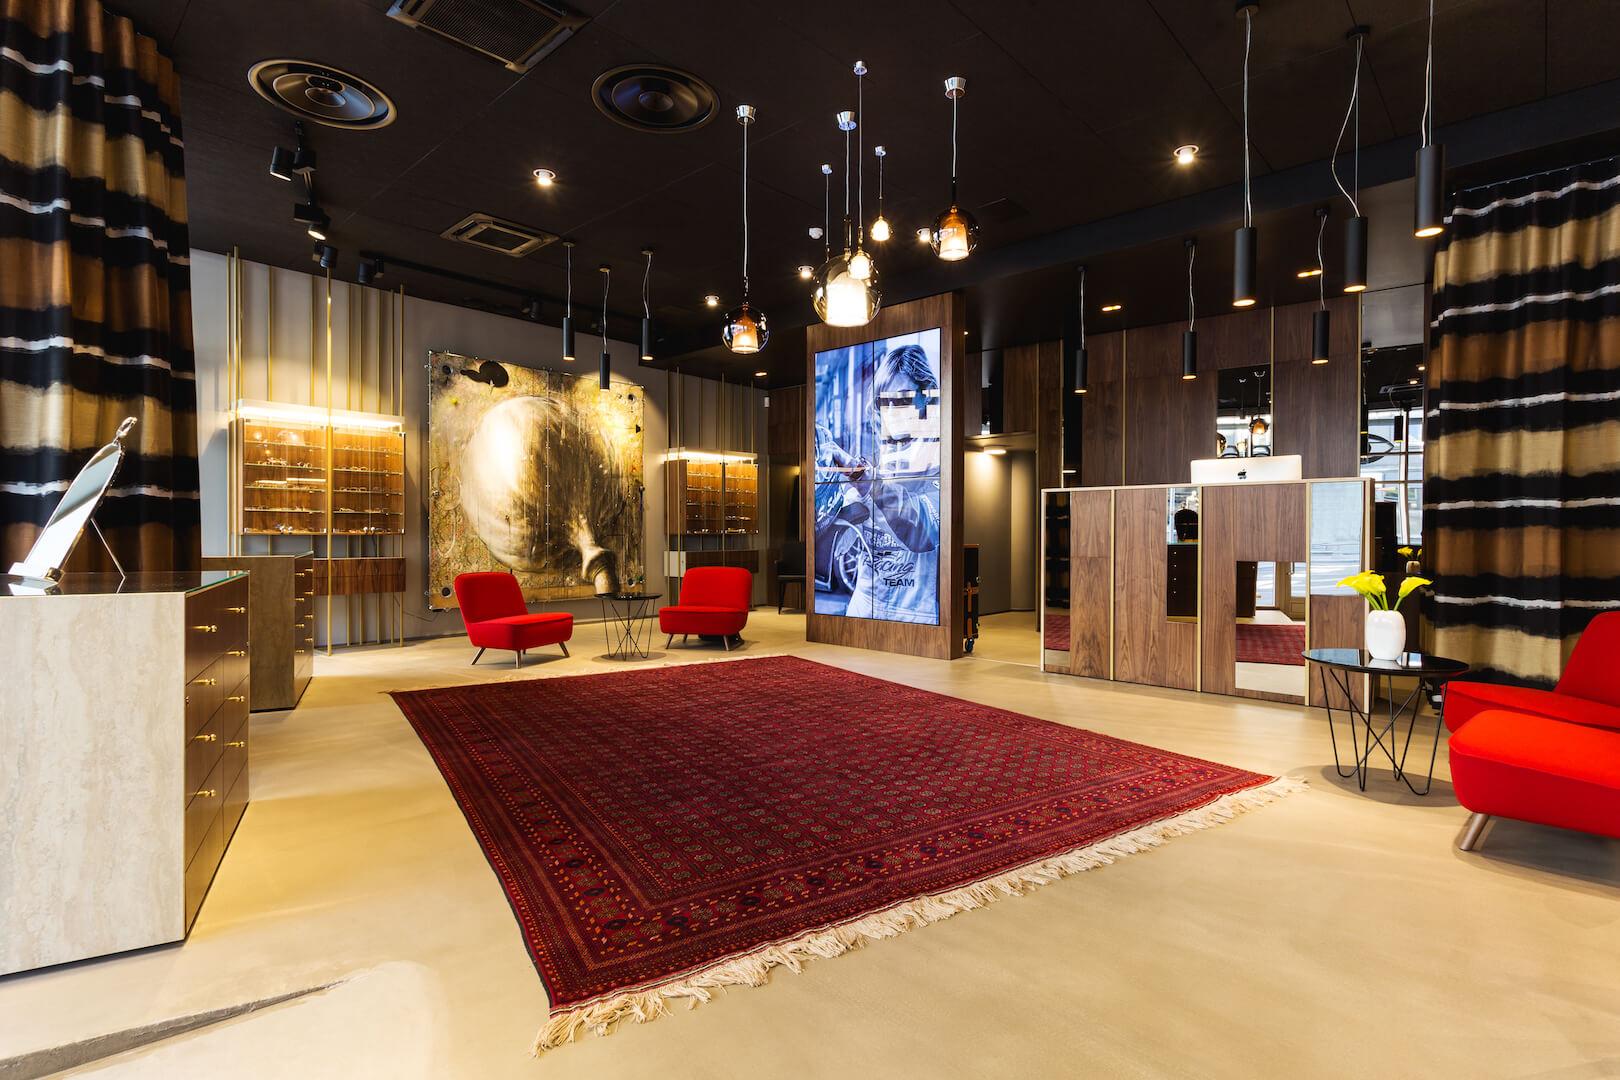 Silmalaser's luxurious showroom